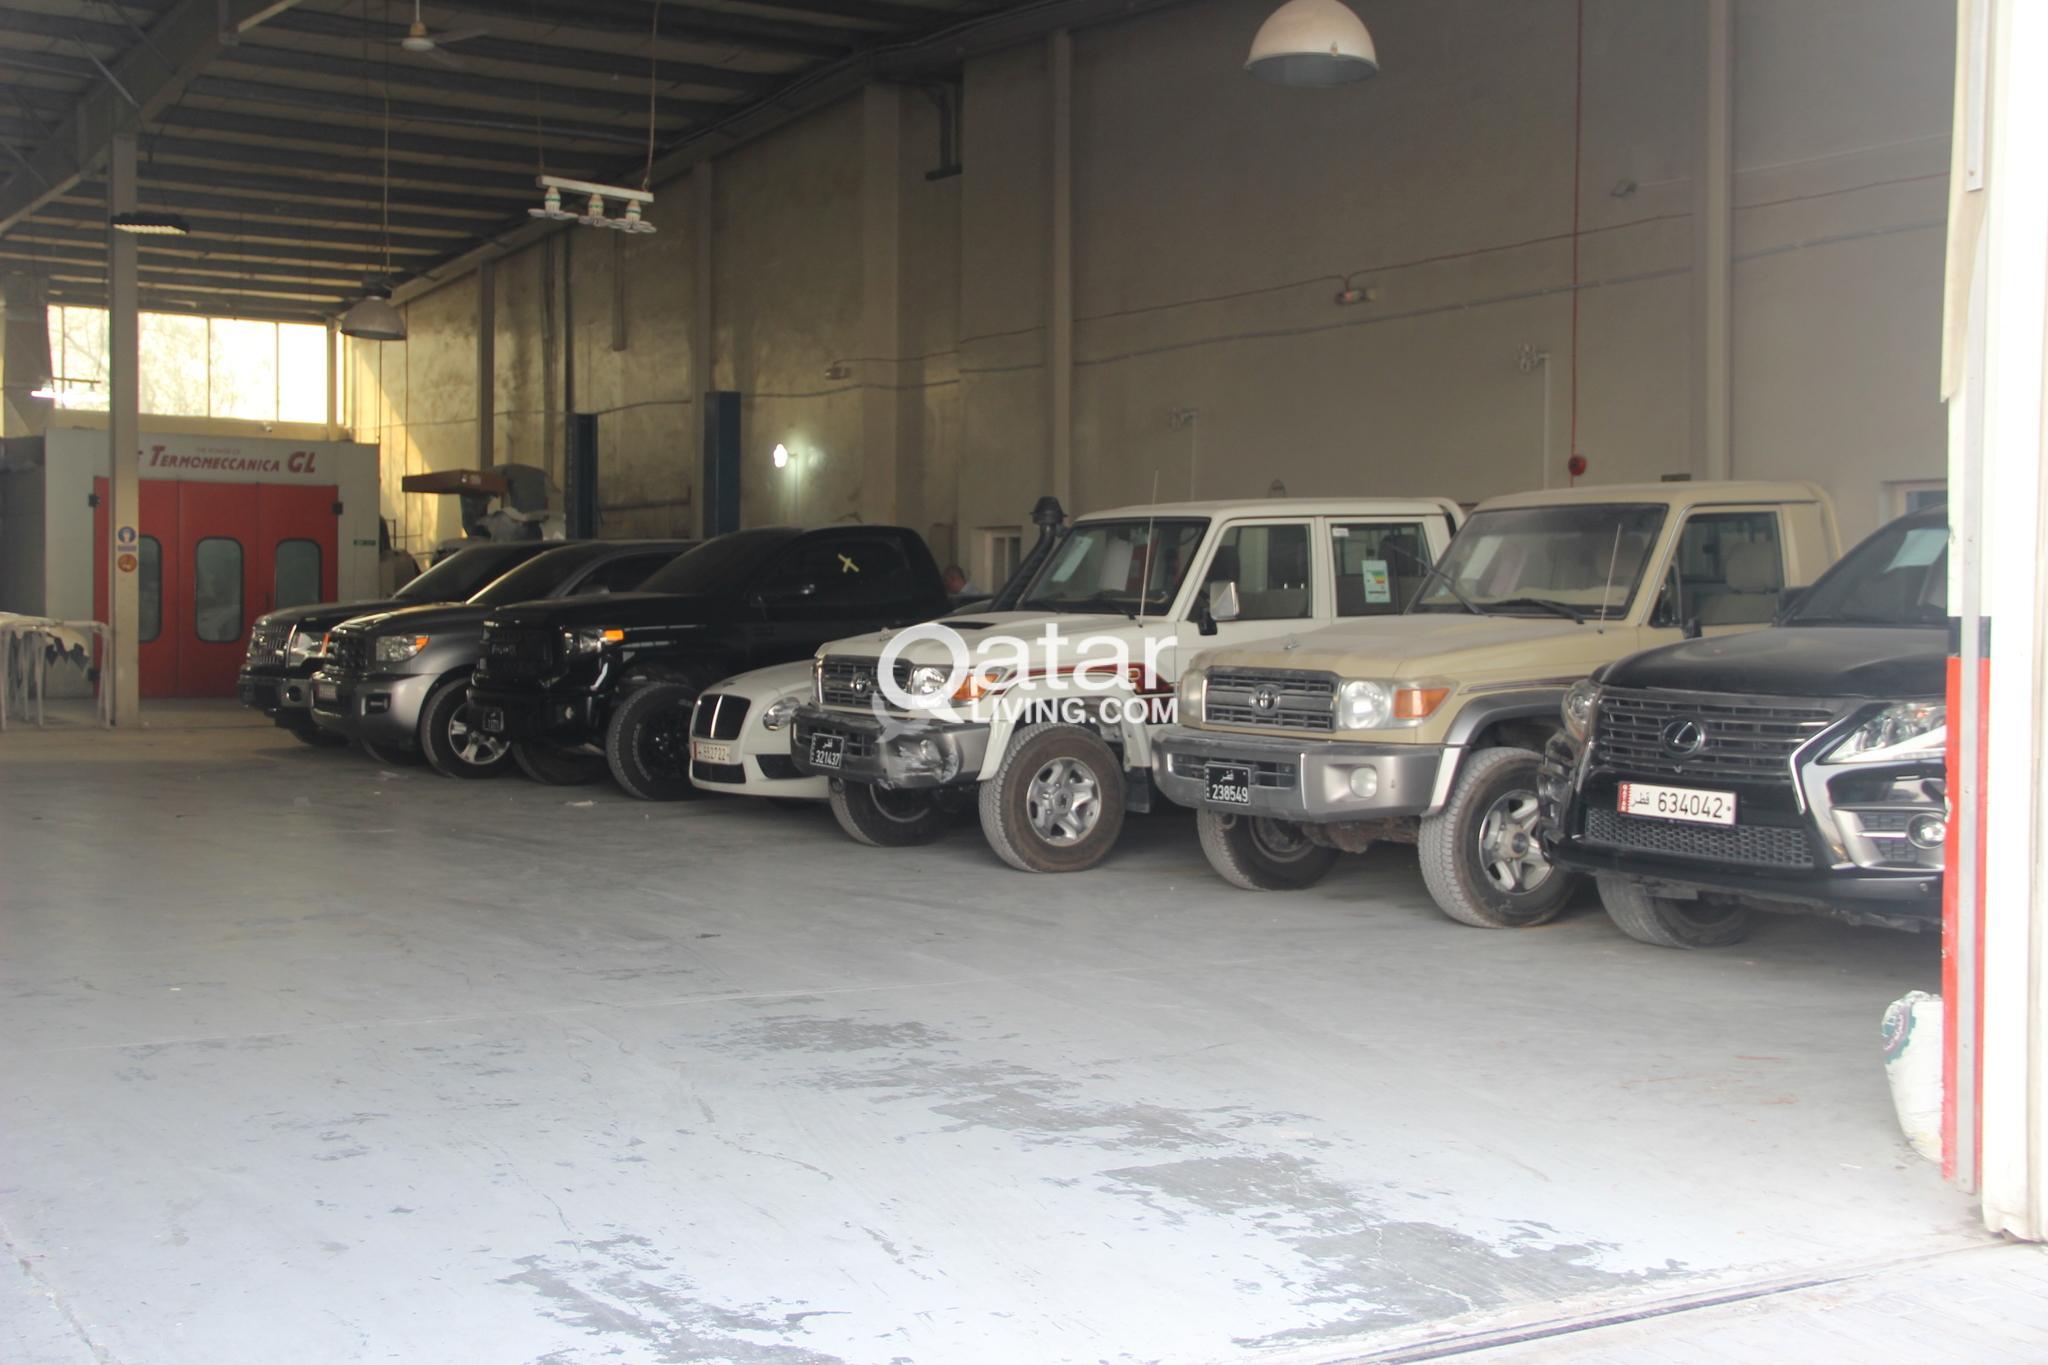 Normandy Garage